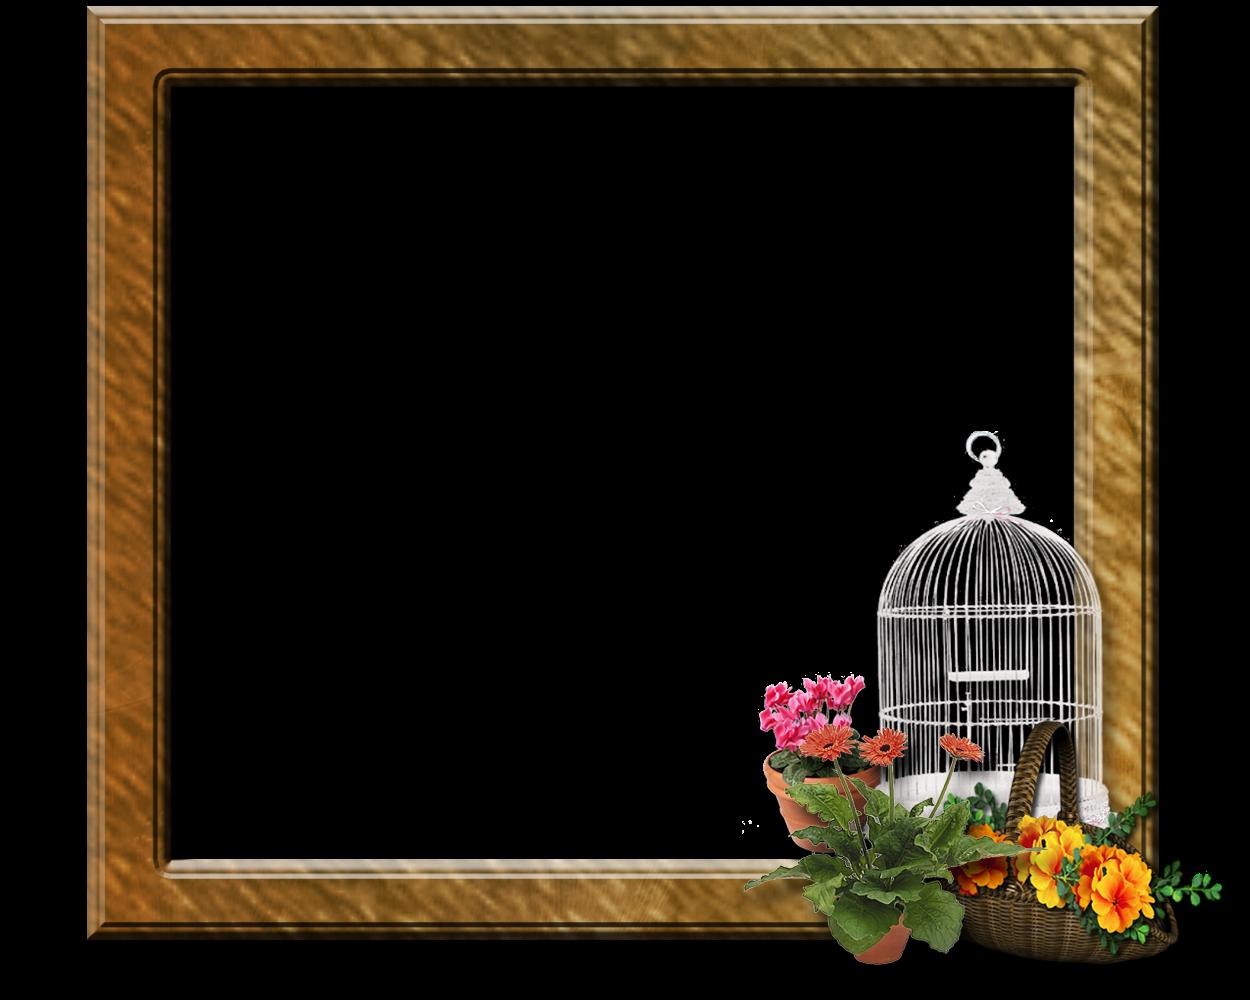 This free scrapbooking frame